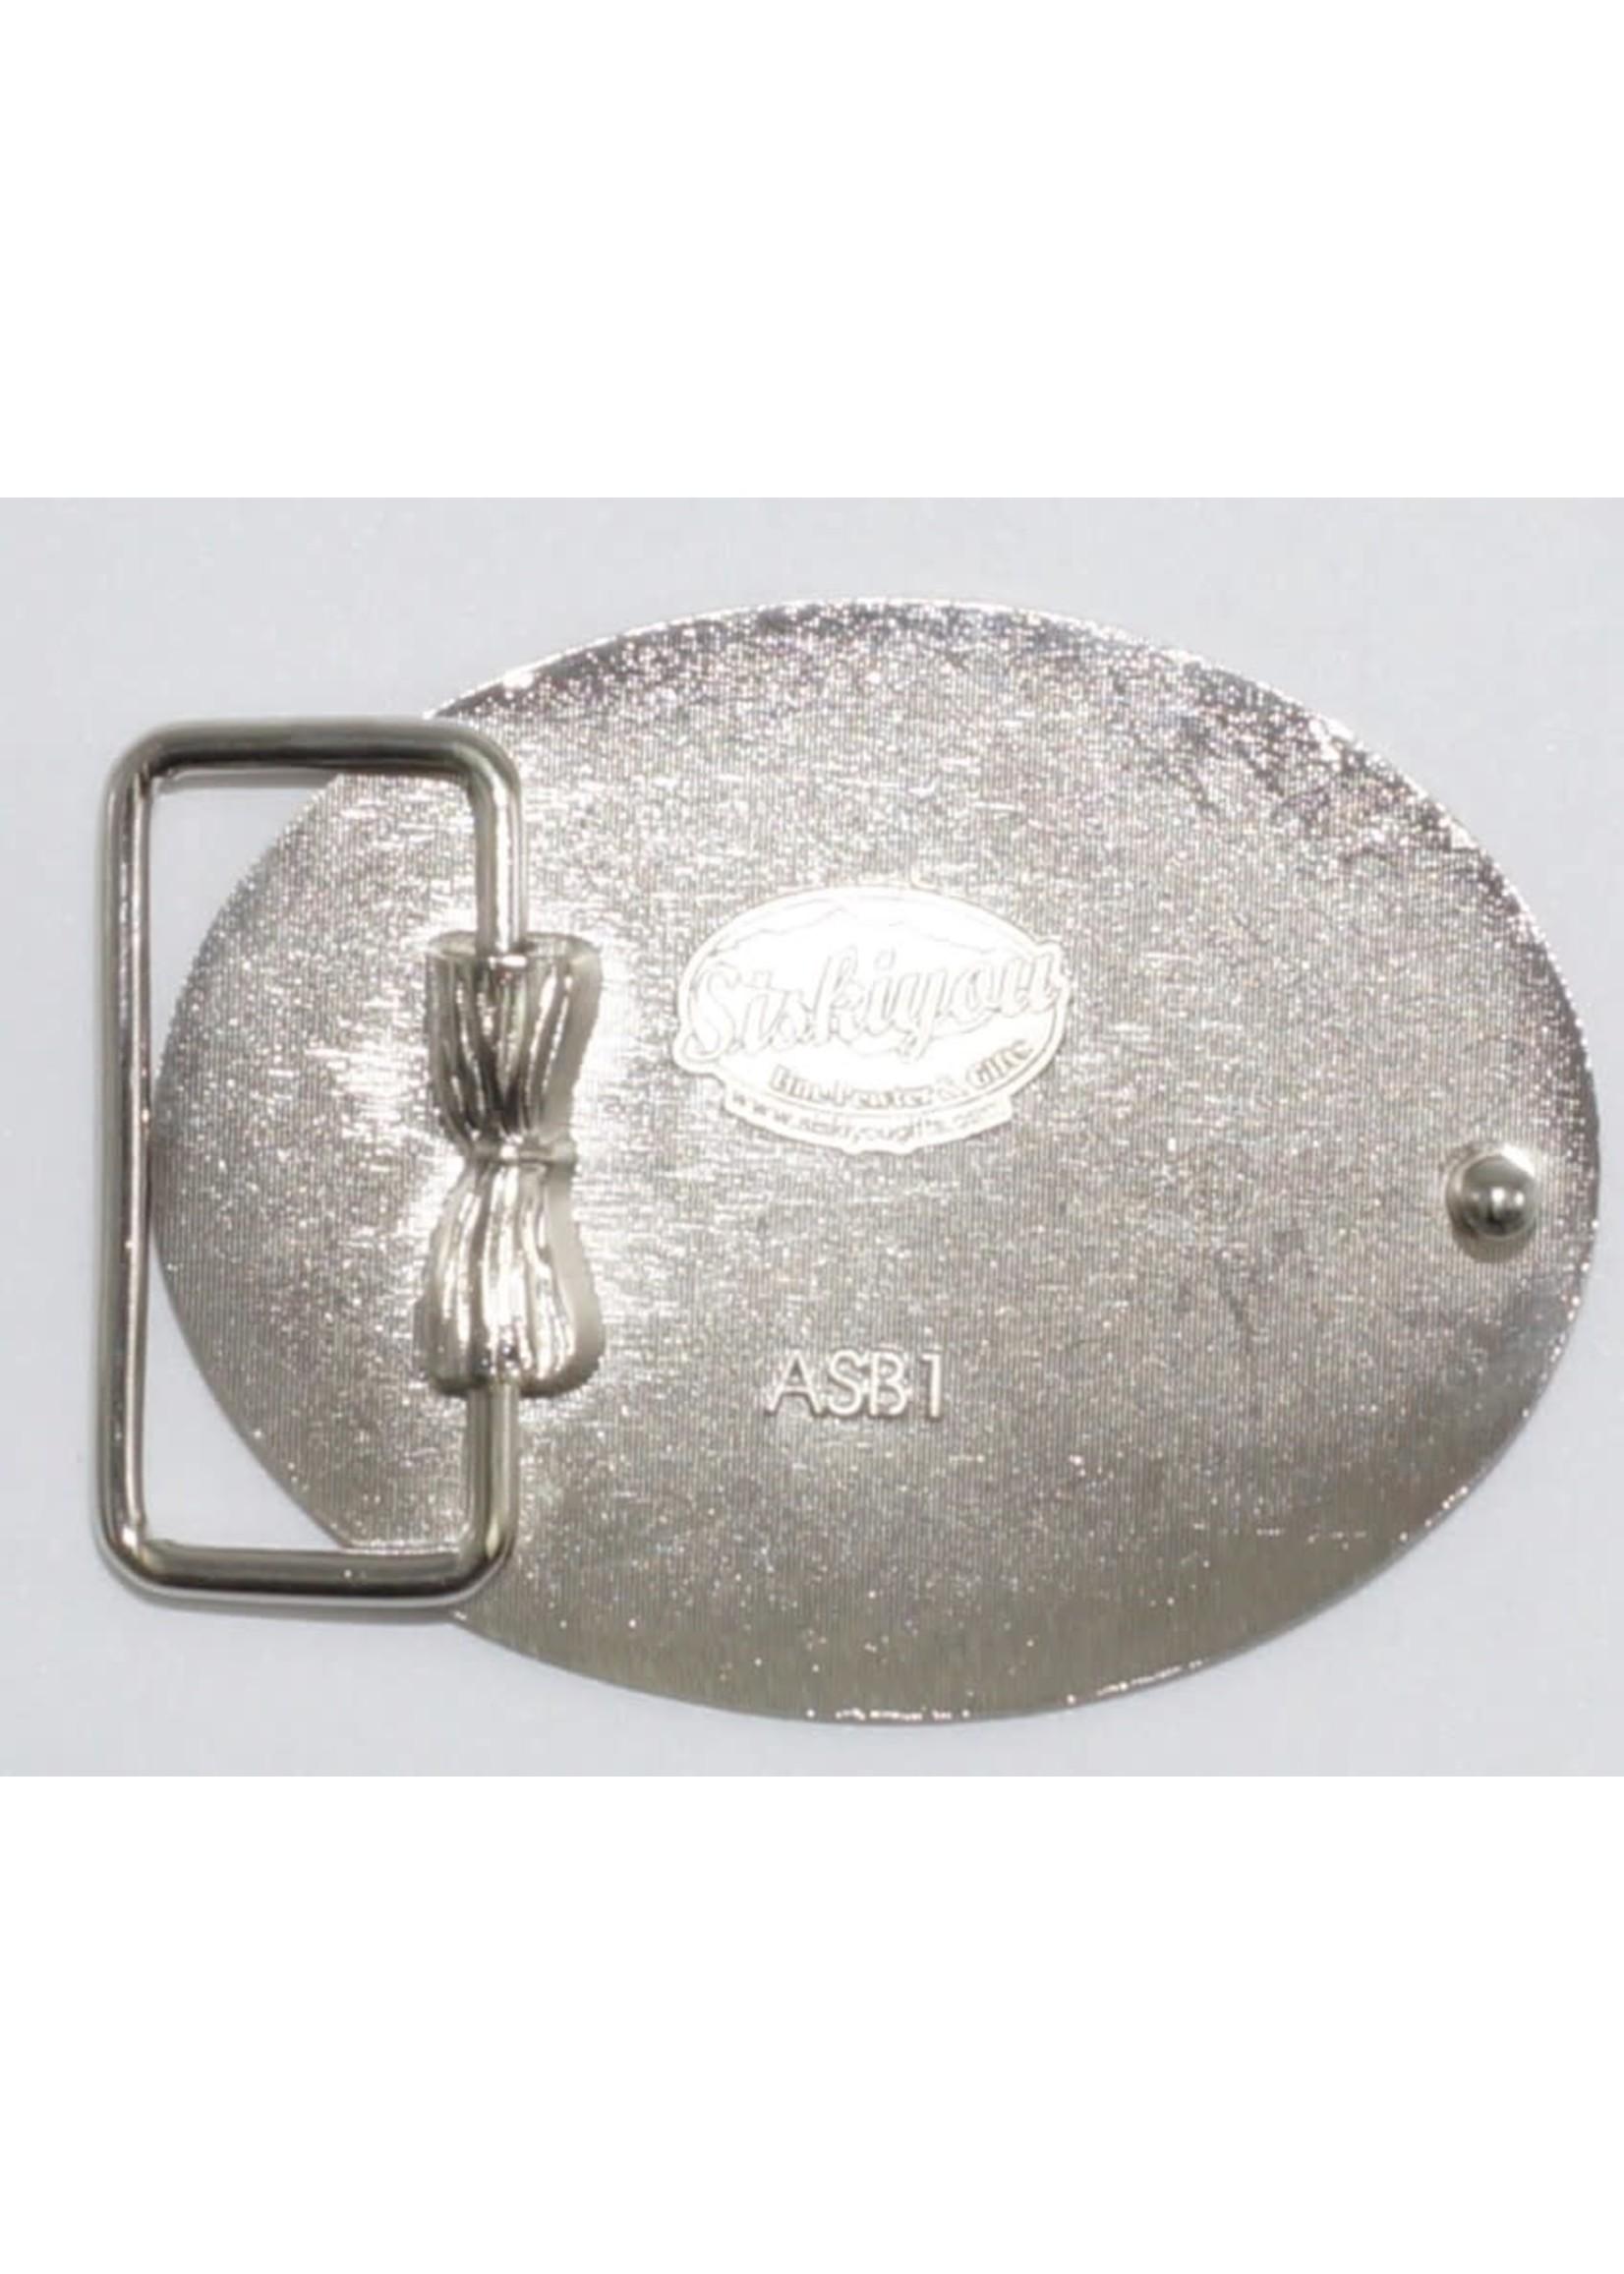 Siskiyou Gifts USMC Enameled Belt Buckle ASB1E